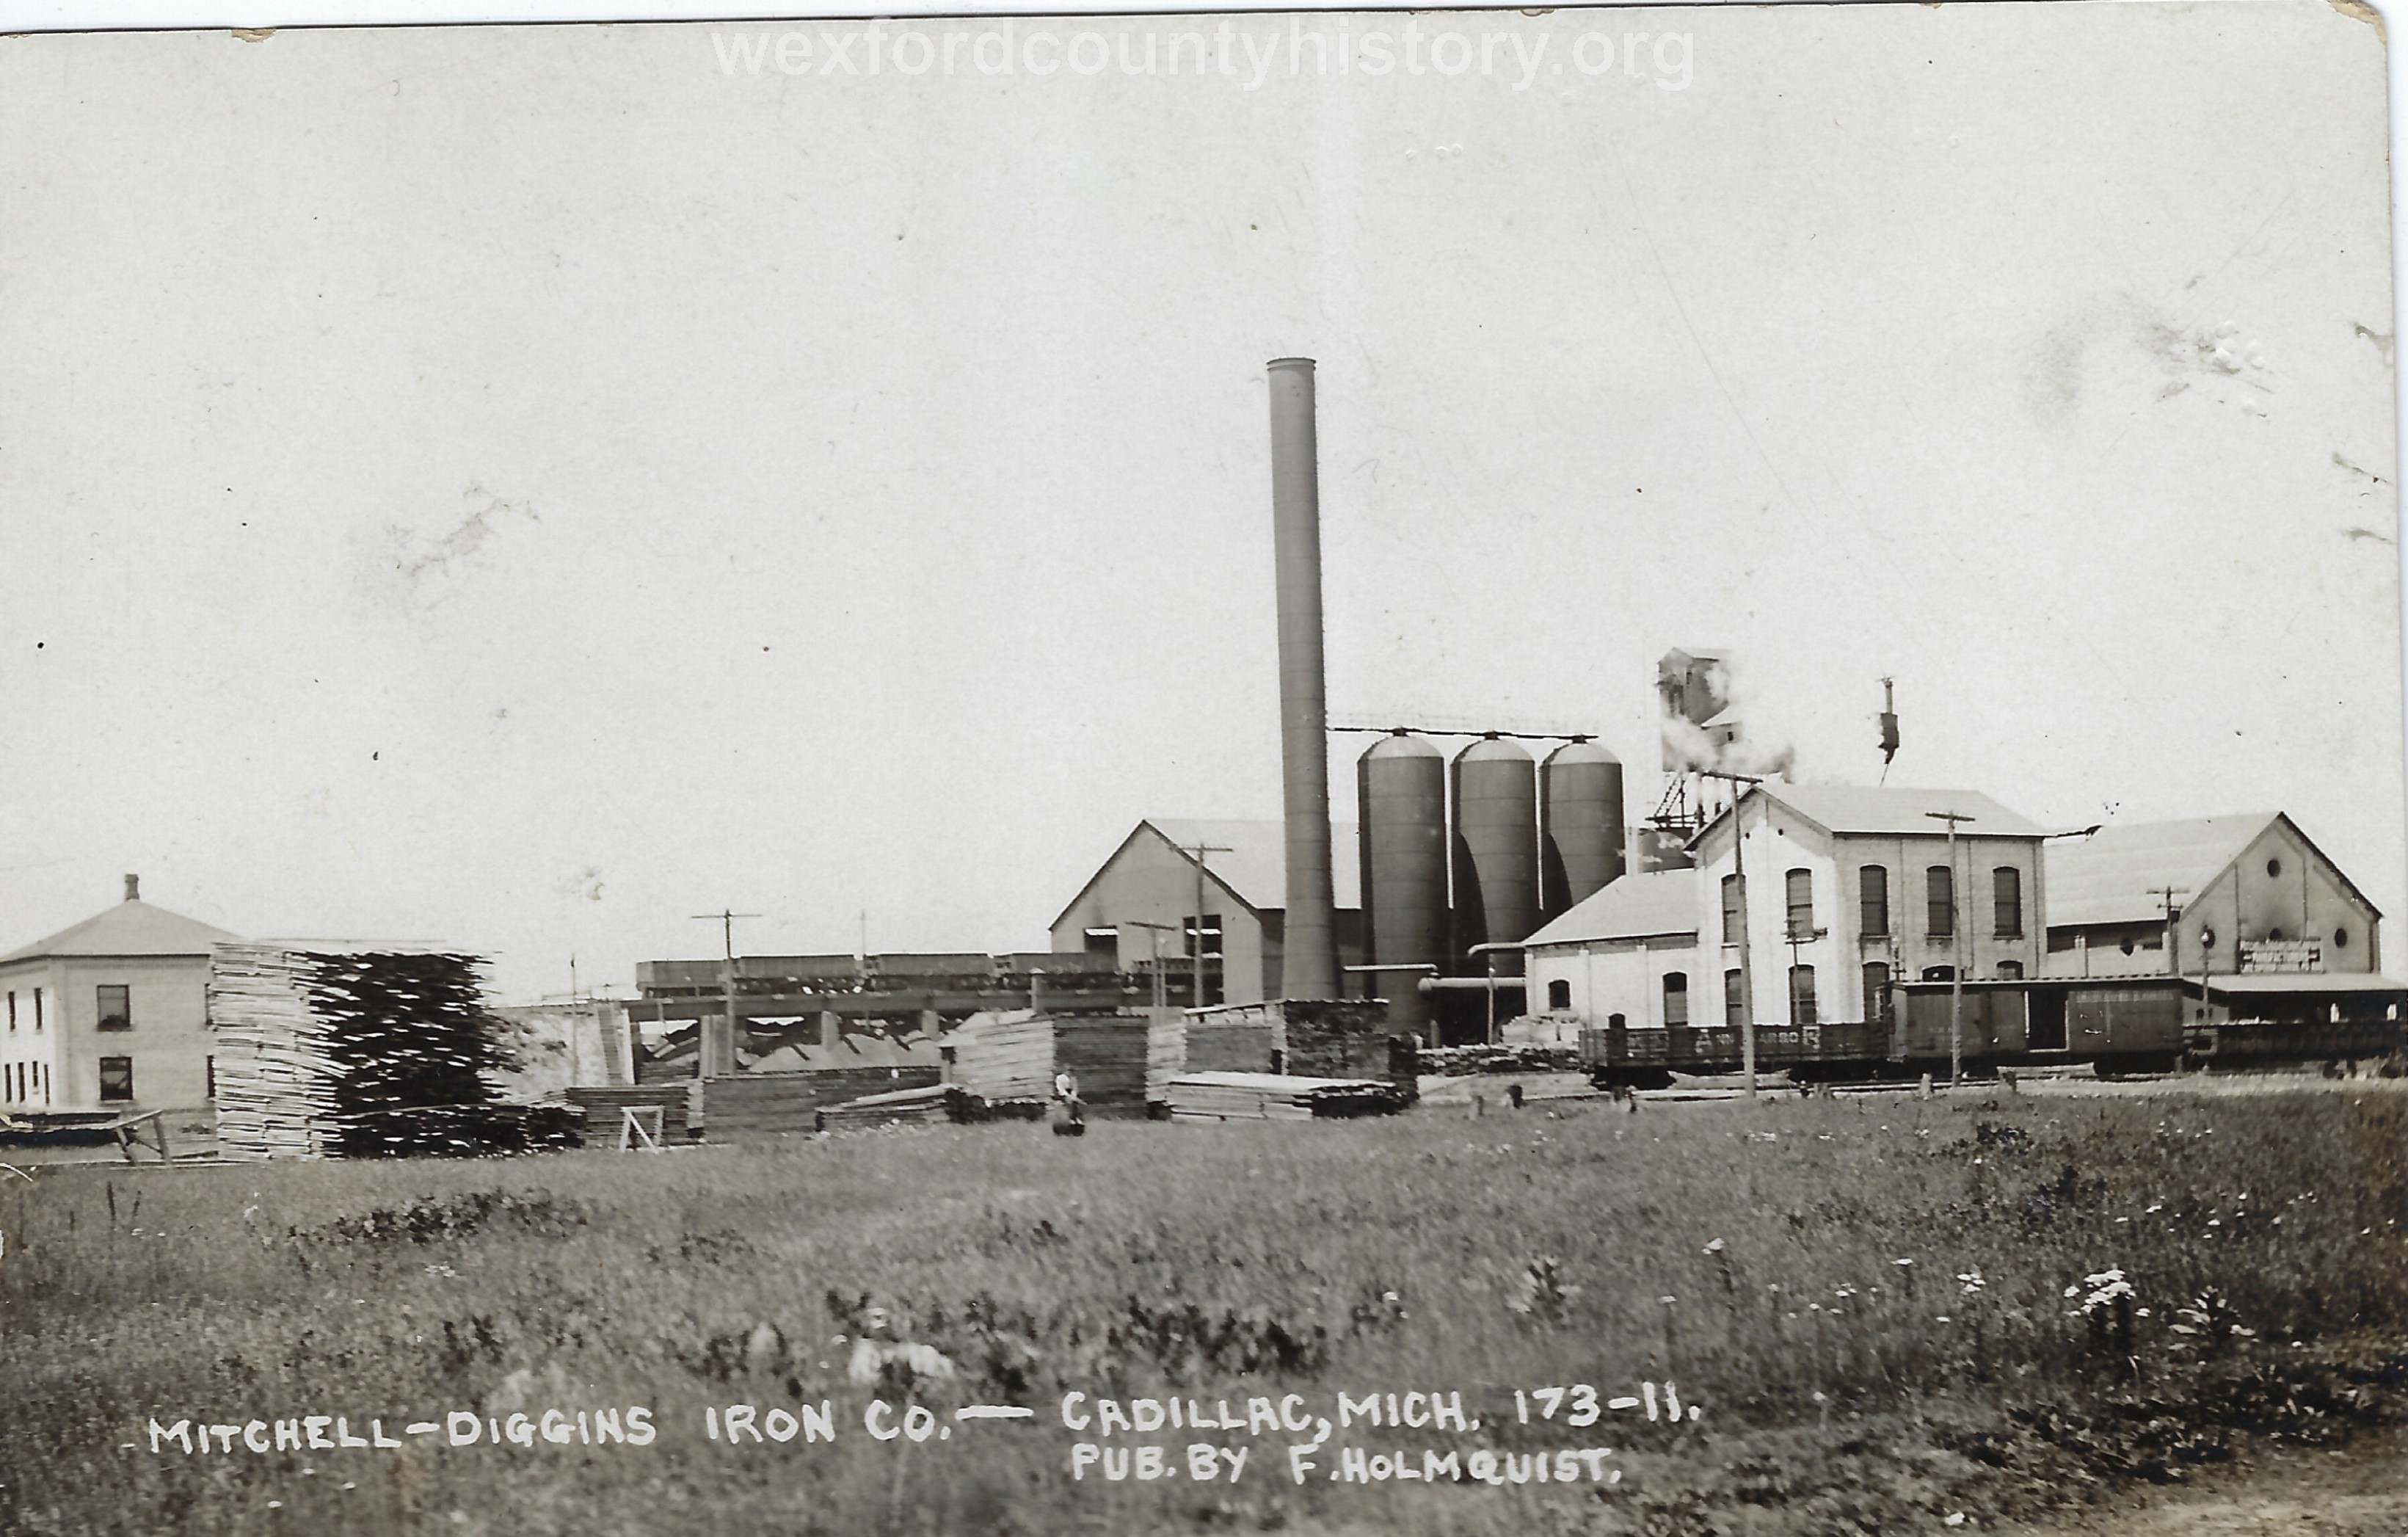 Mitchell Diggins Iron Company